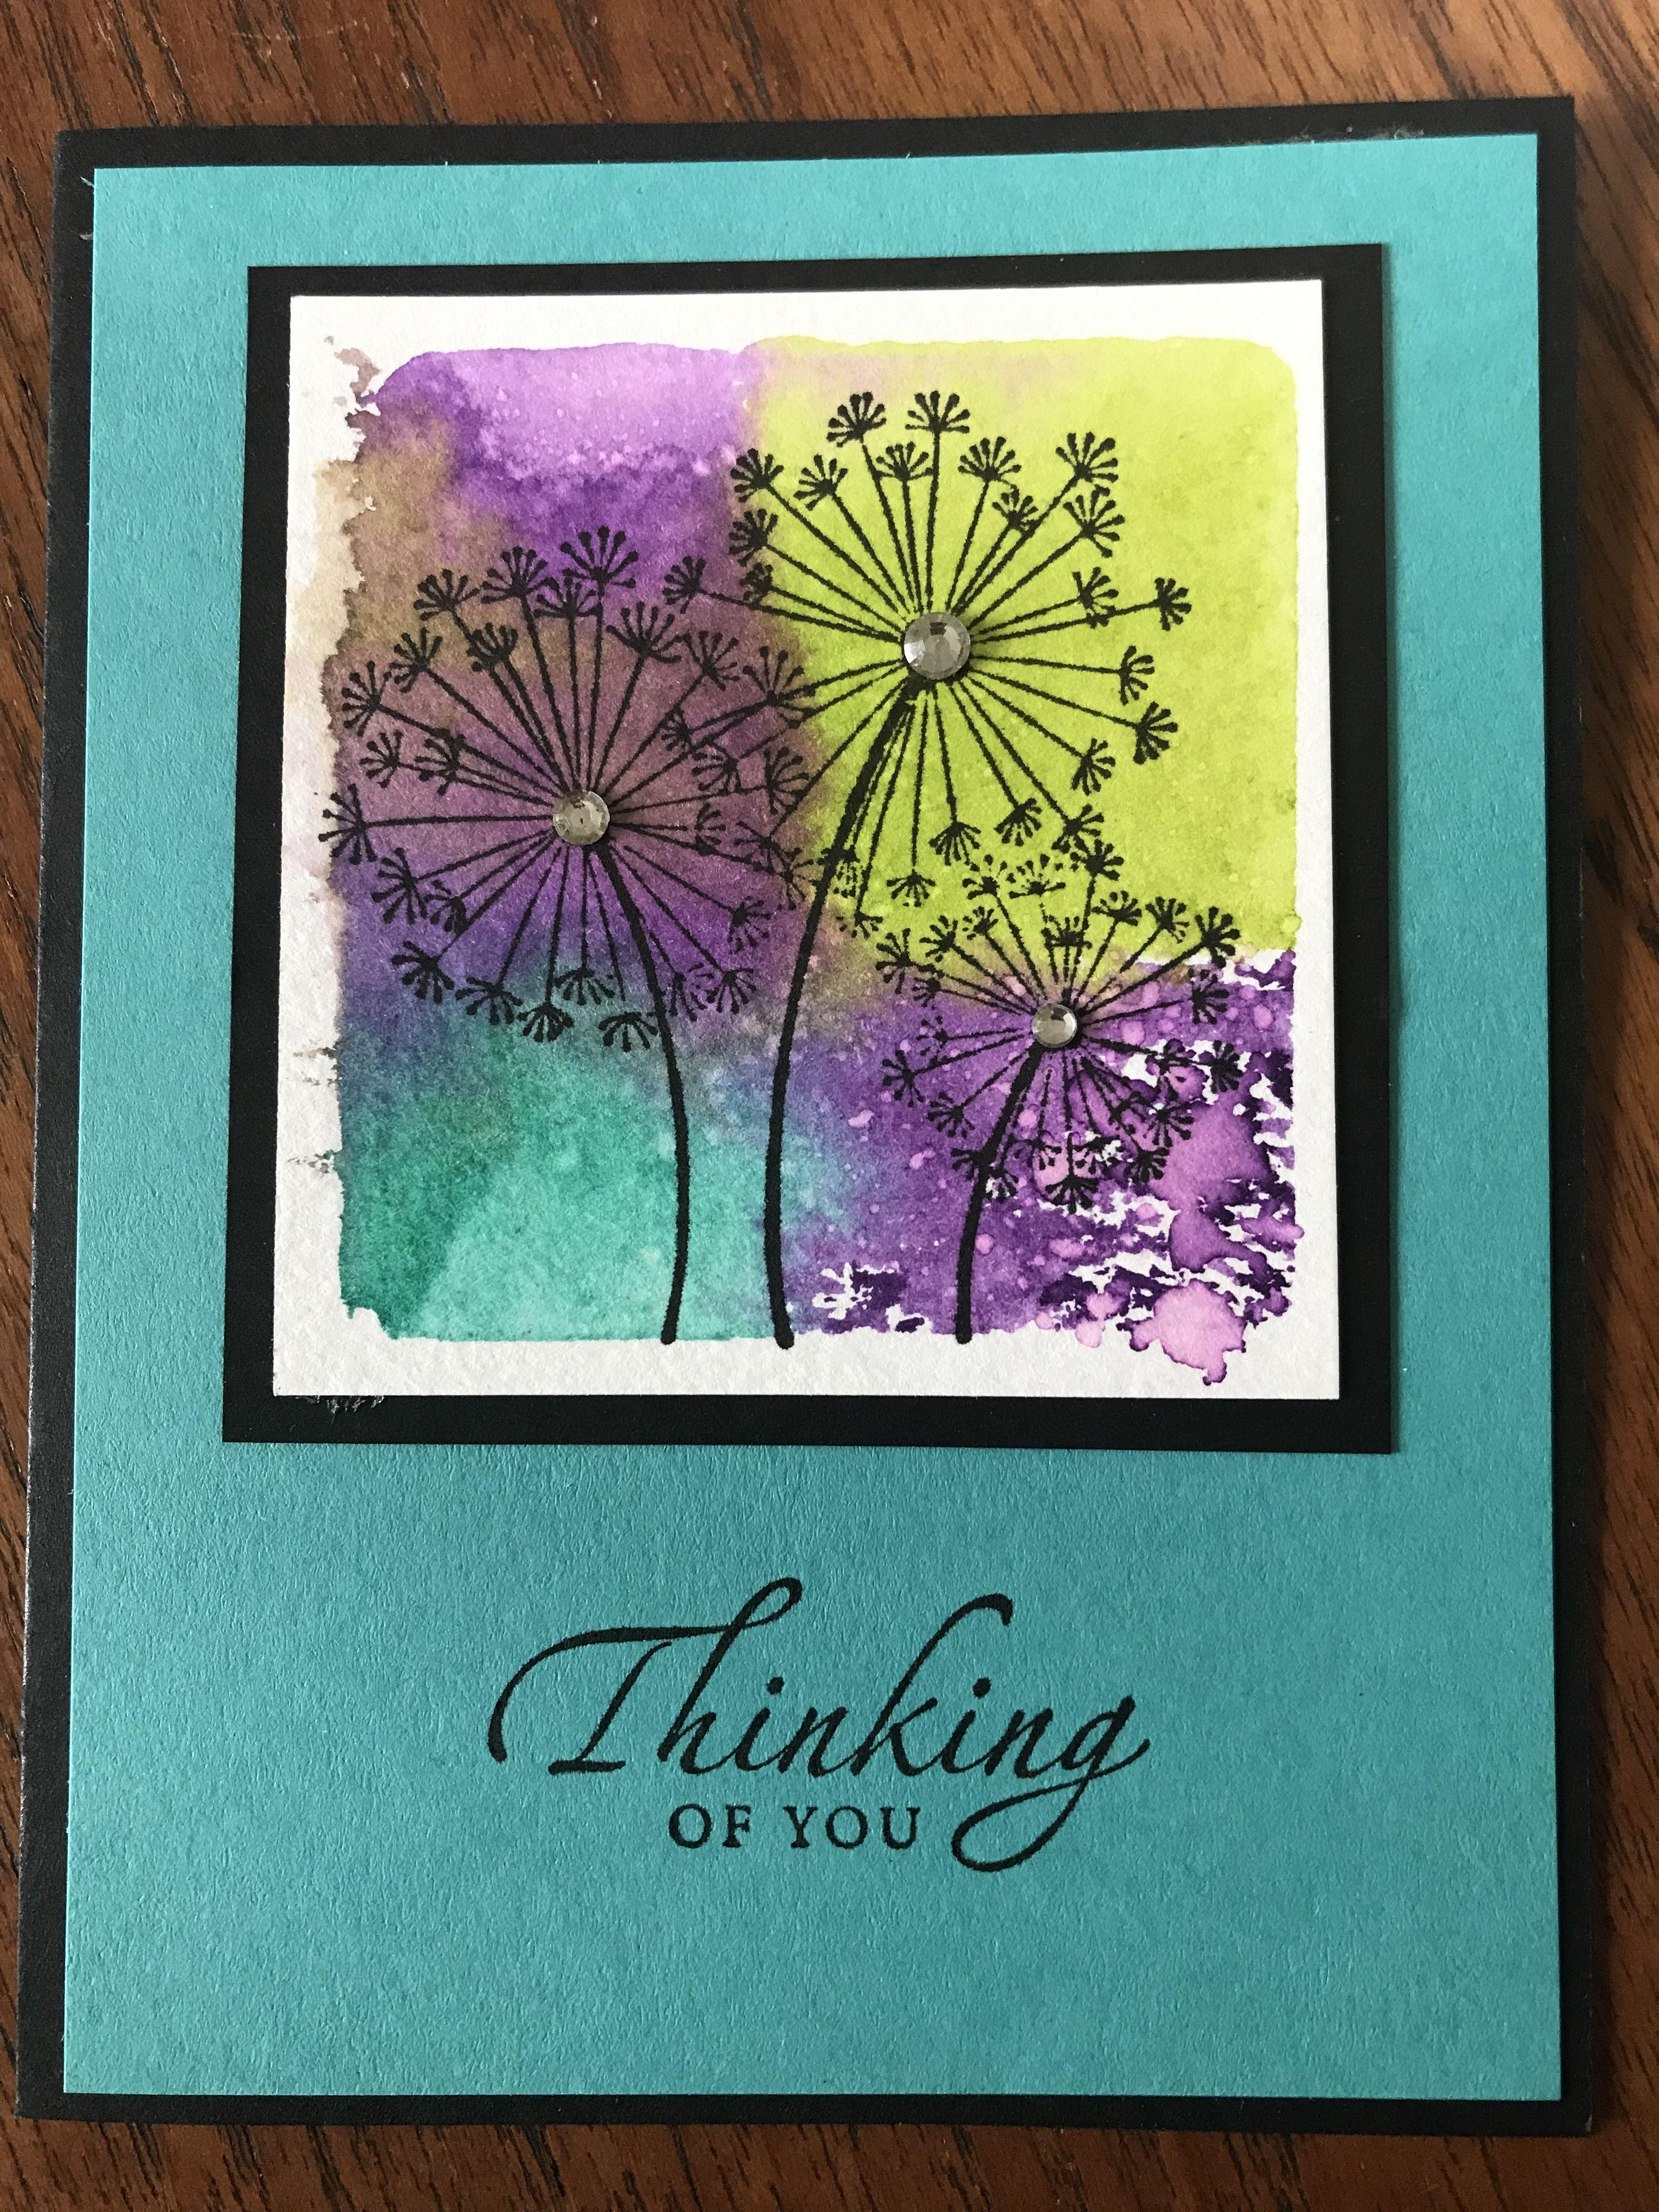 Stampin Up S Dandelion Wishes Floral Cards Stamped Cards Dandelion Wish